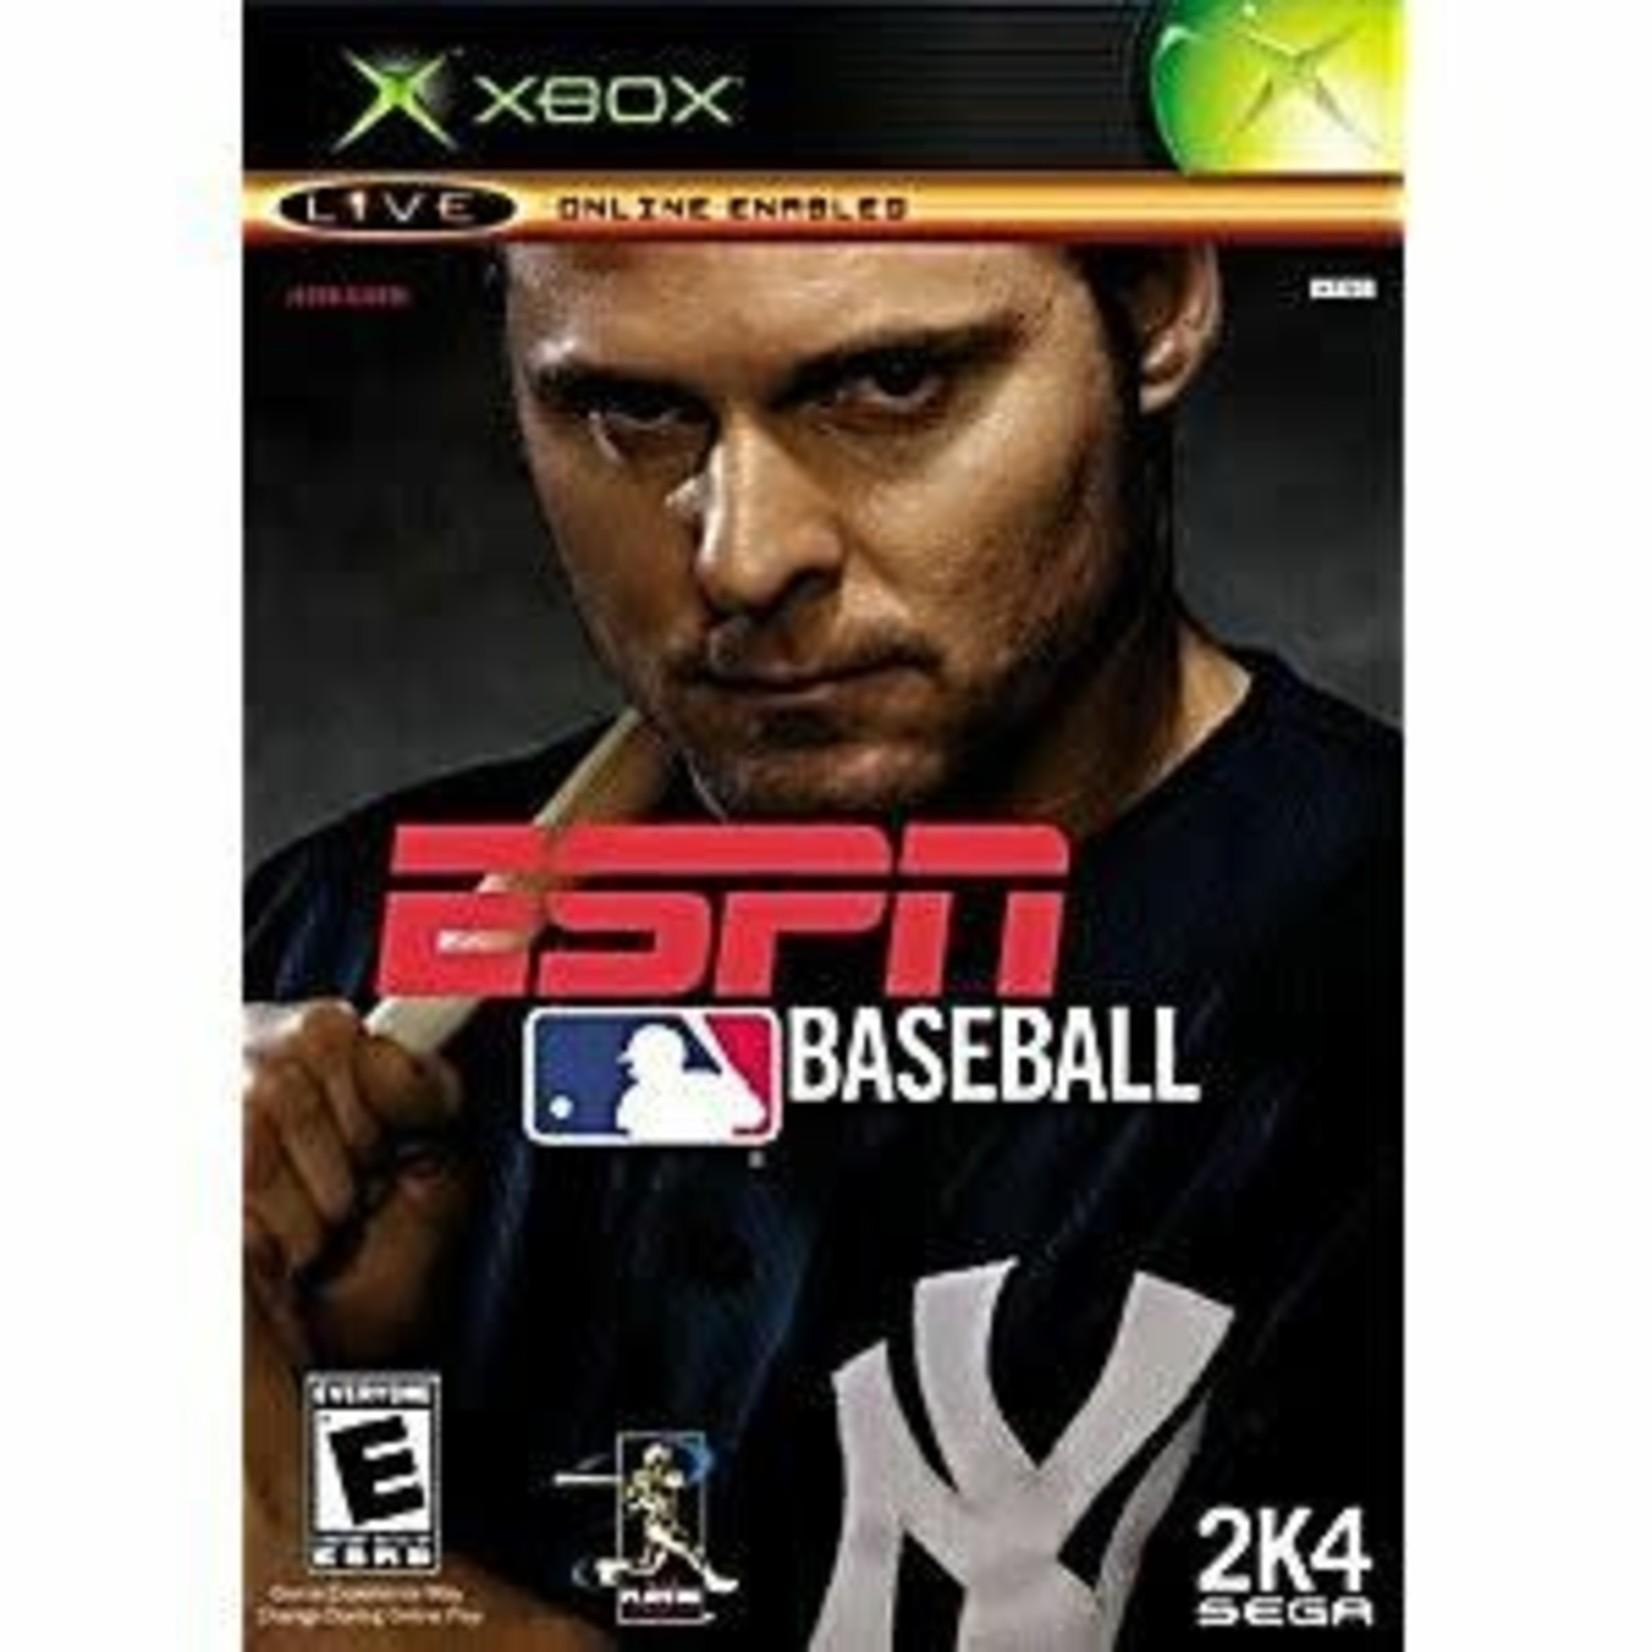 XBU-ESPN Baseball